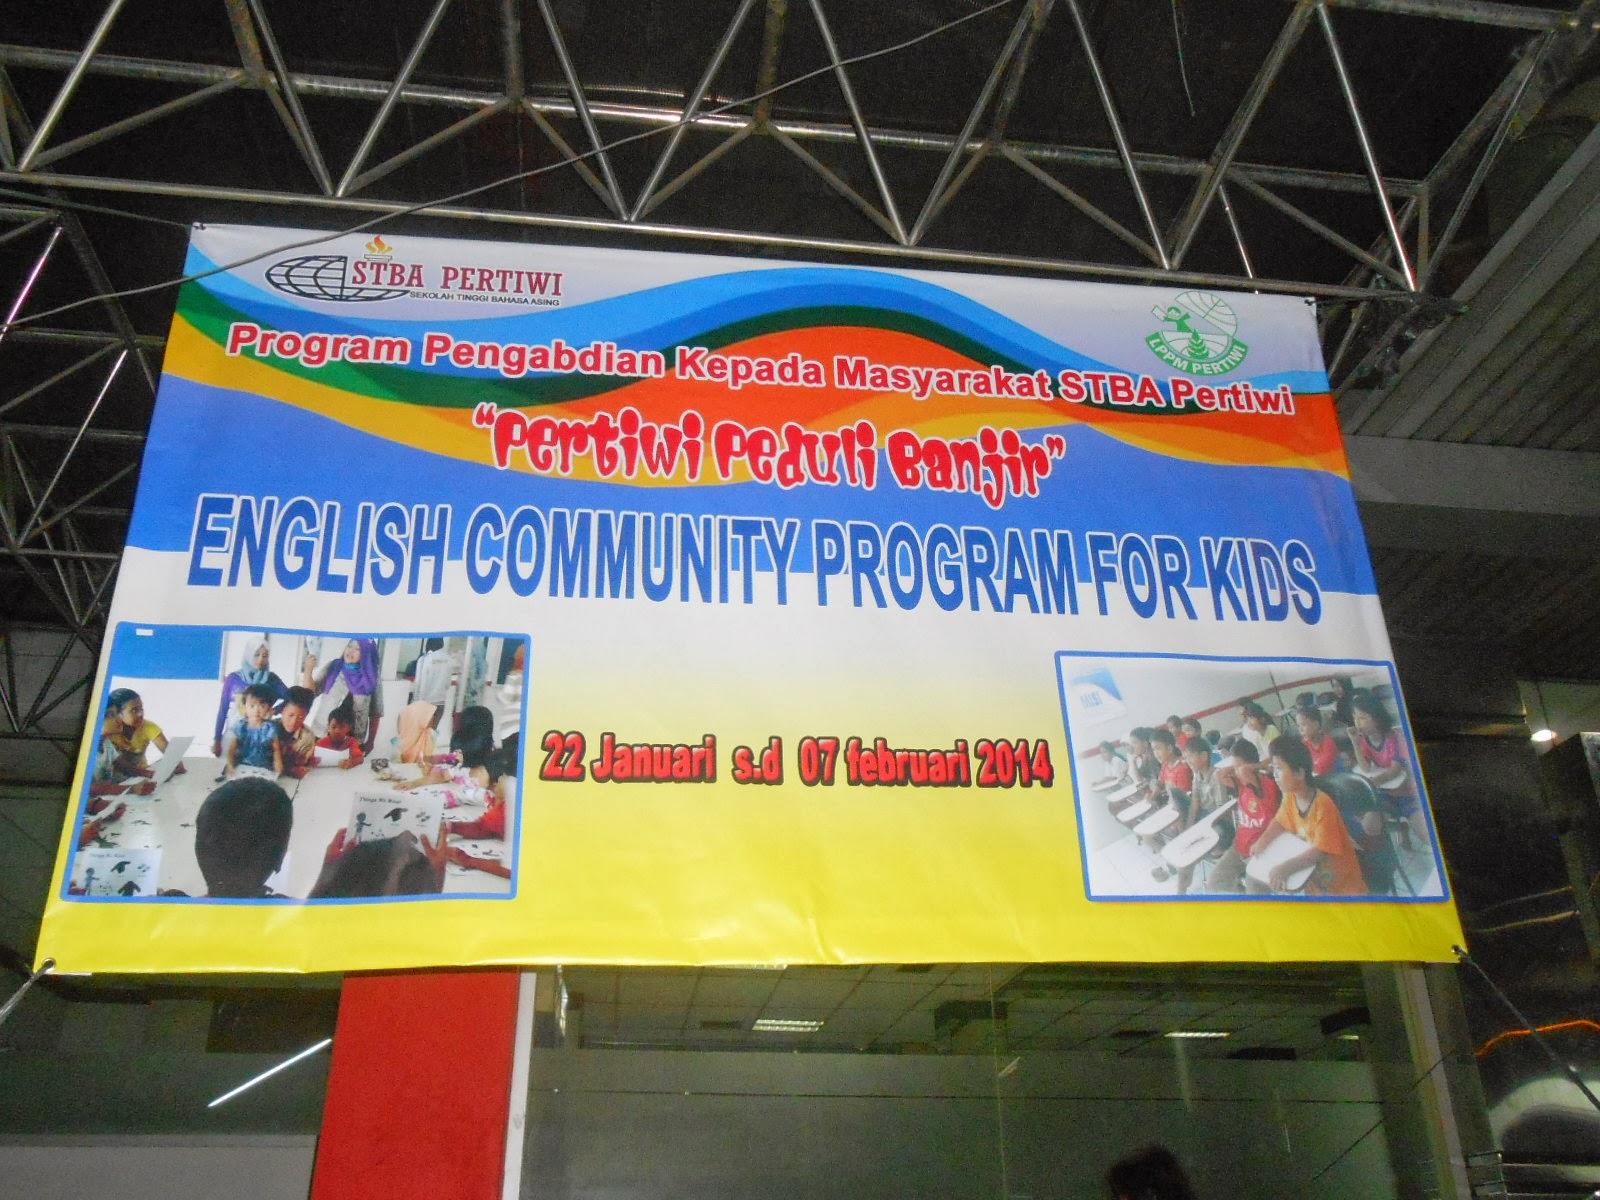 English Community Program